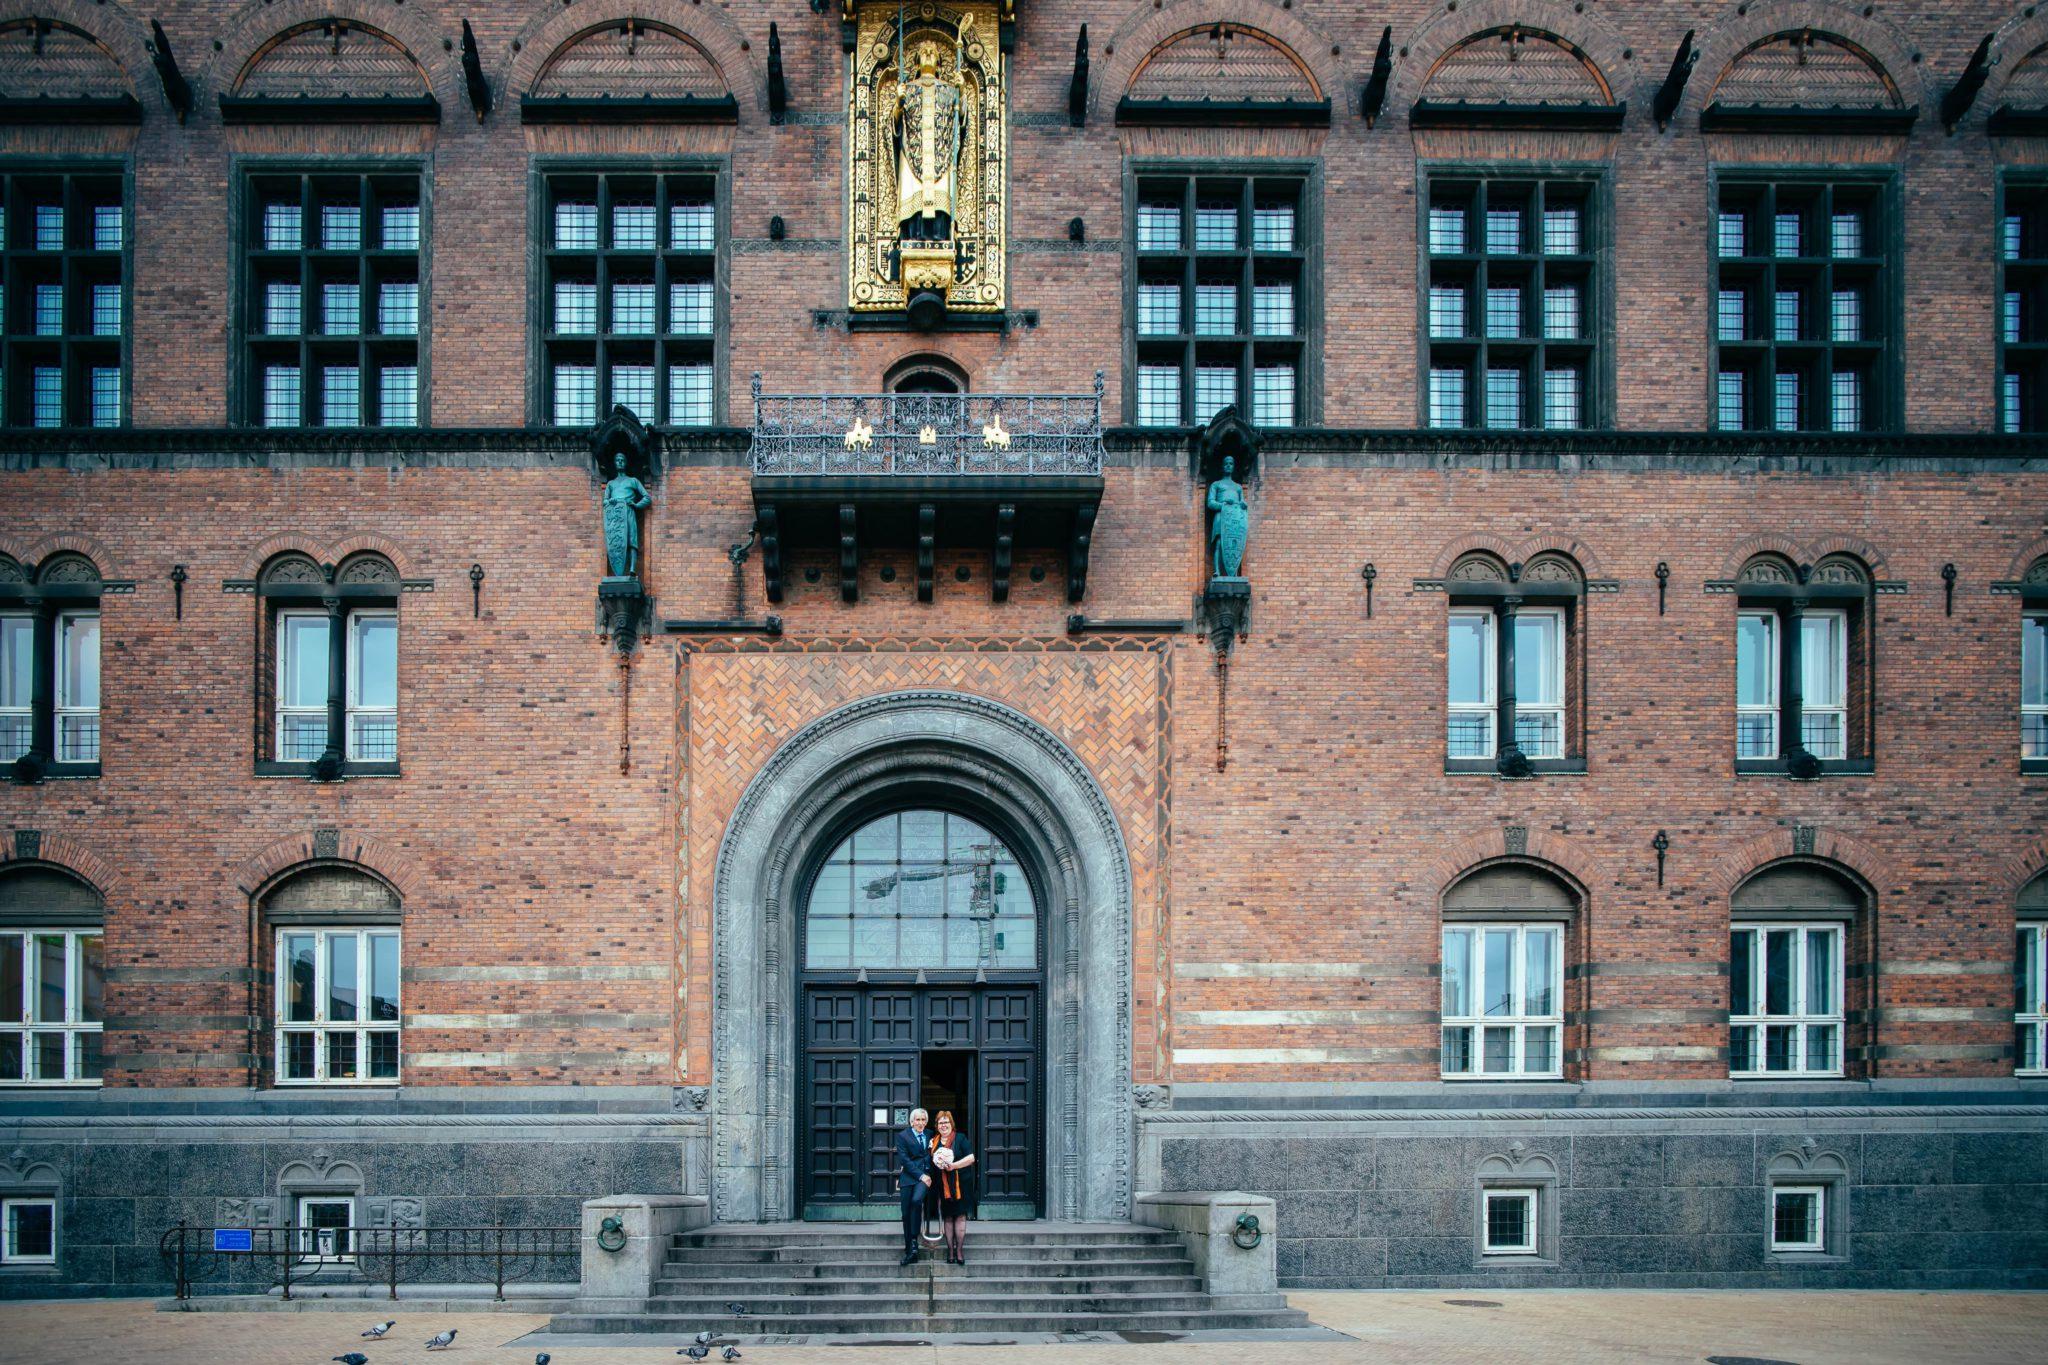 kopenhagen-heiraten-agentur-konstannta